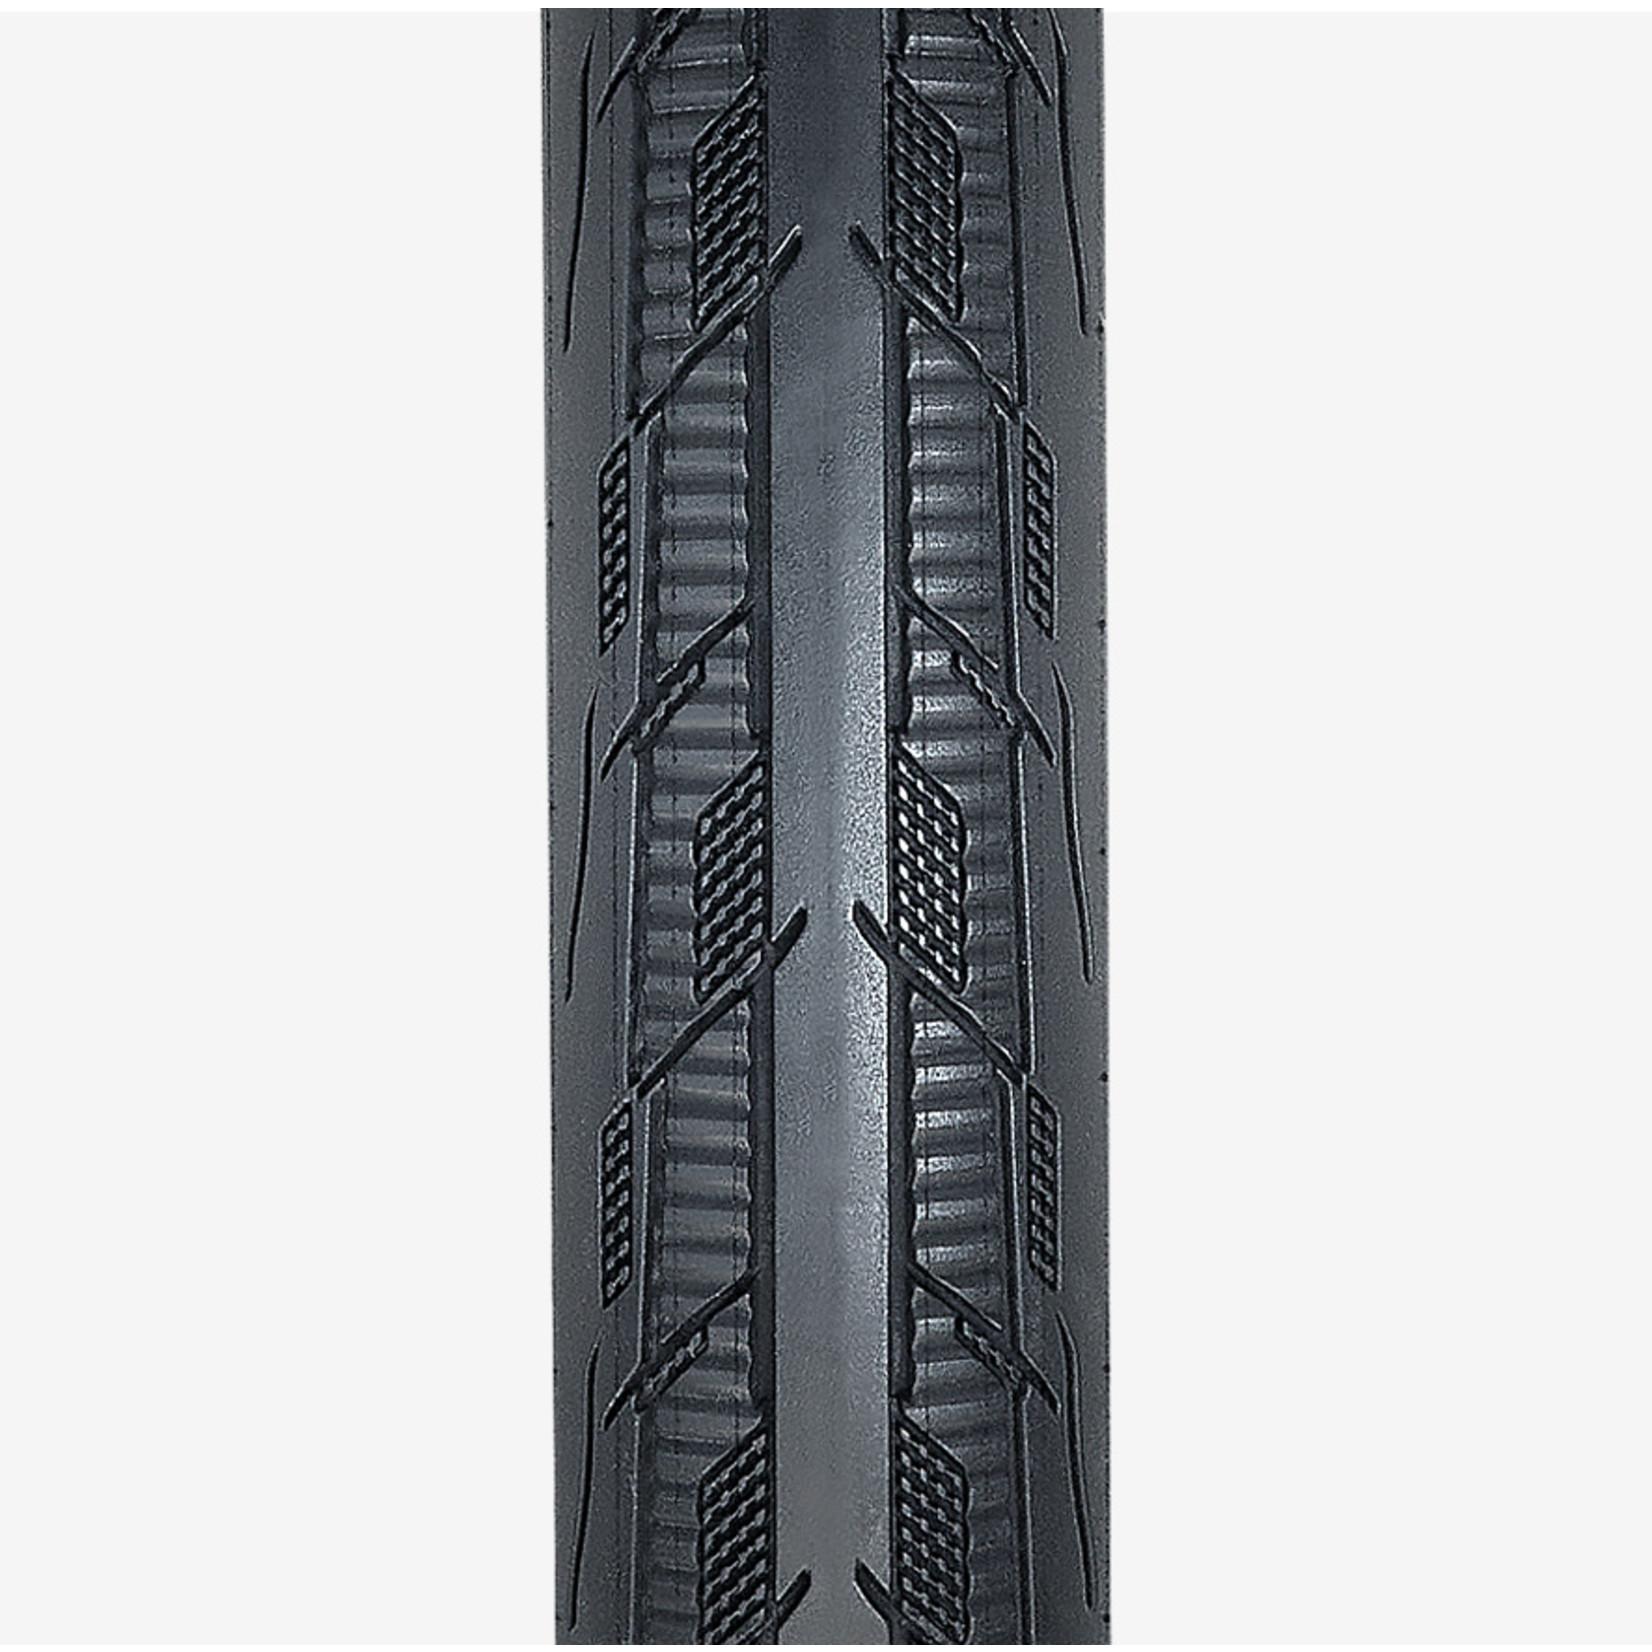 Tioga Tioga FASTR React Black Label Tire Foldable